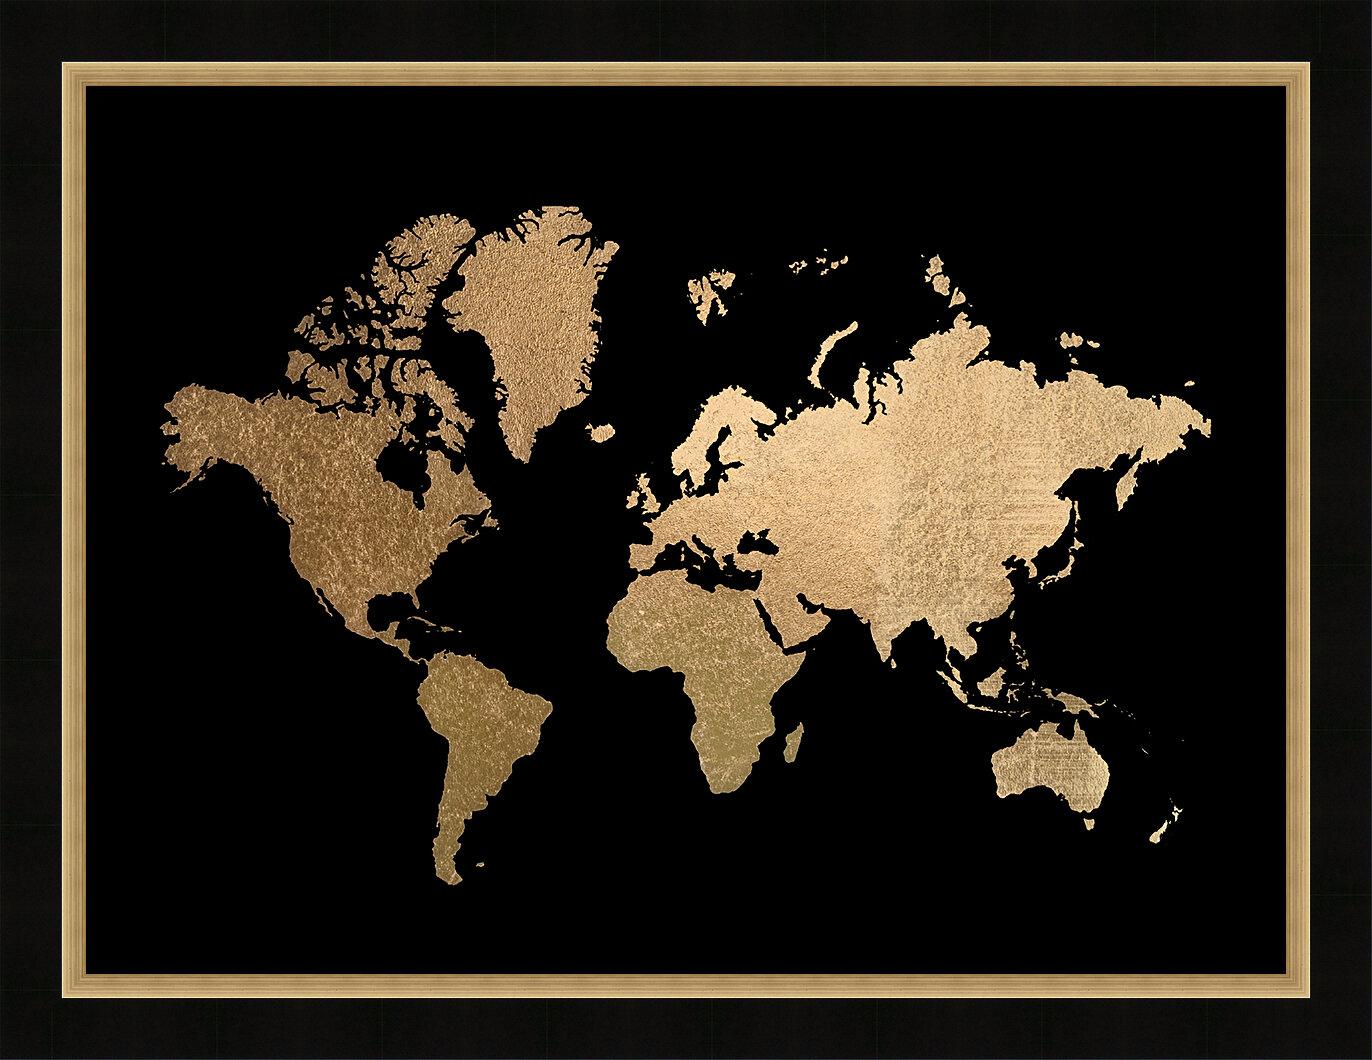 Gold Foil World Map Framed.Brayden Studio Gold Foil World Map Framed Graphic Art Print